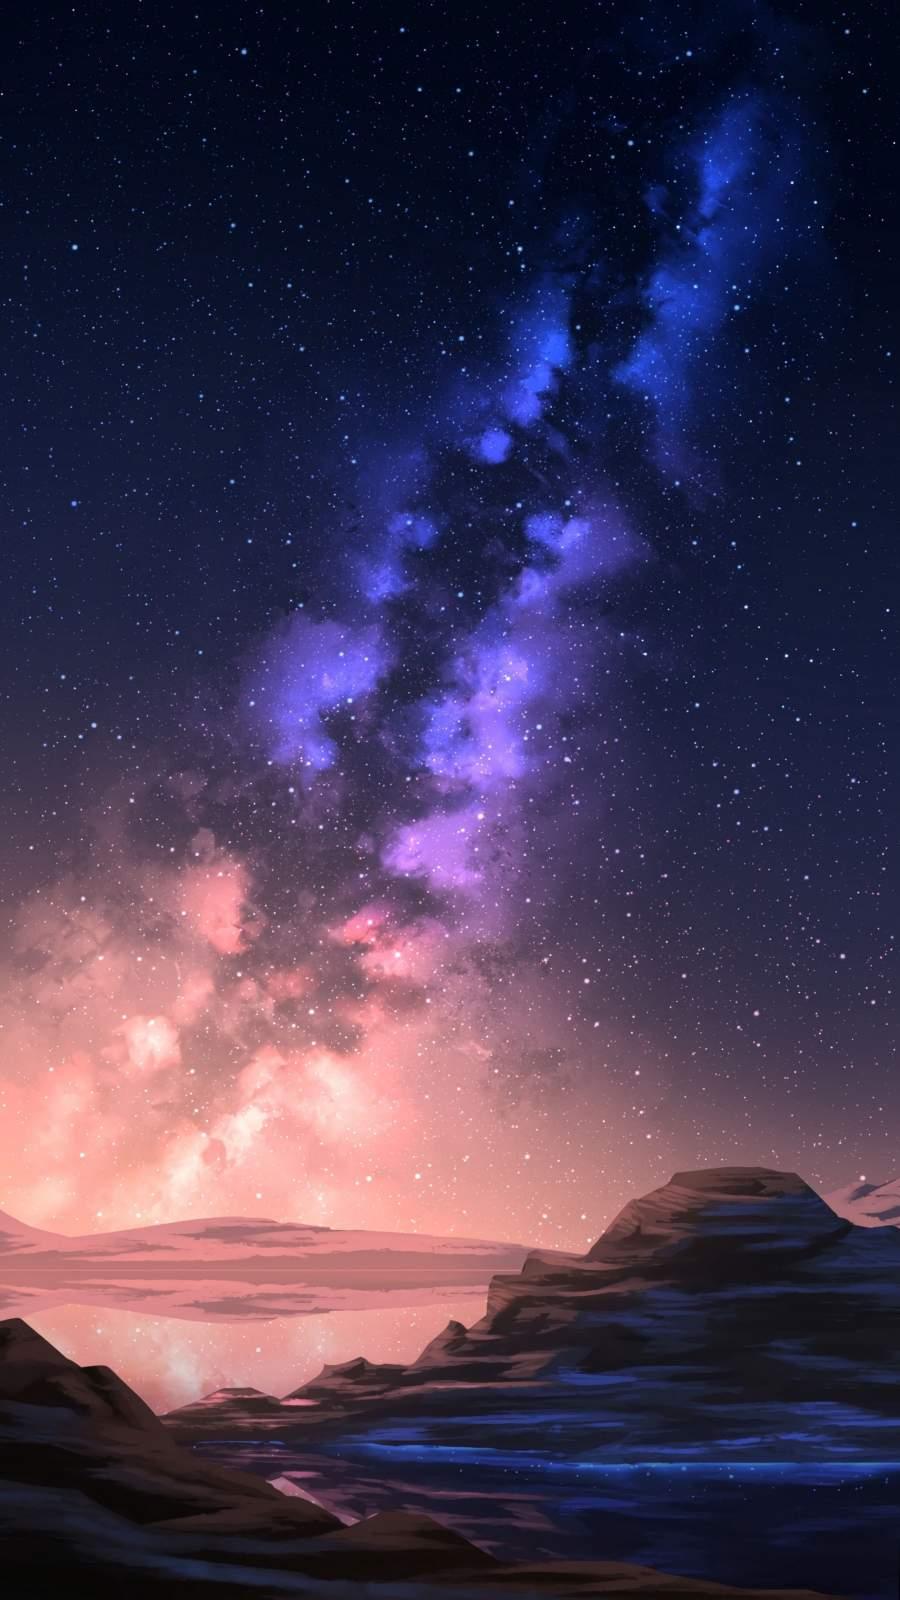 Milky Way Galaxy View in Night Scenery